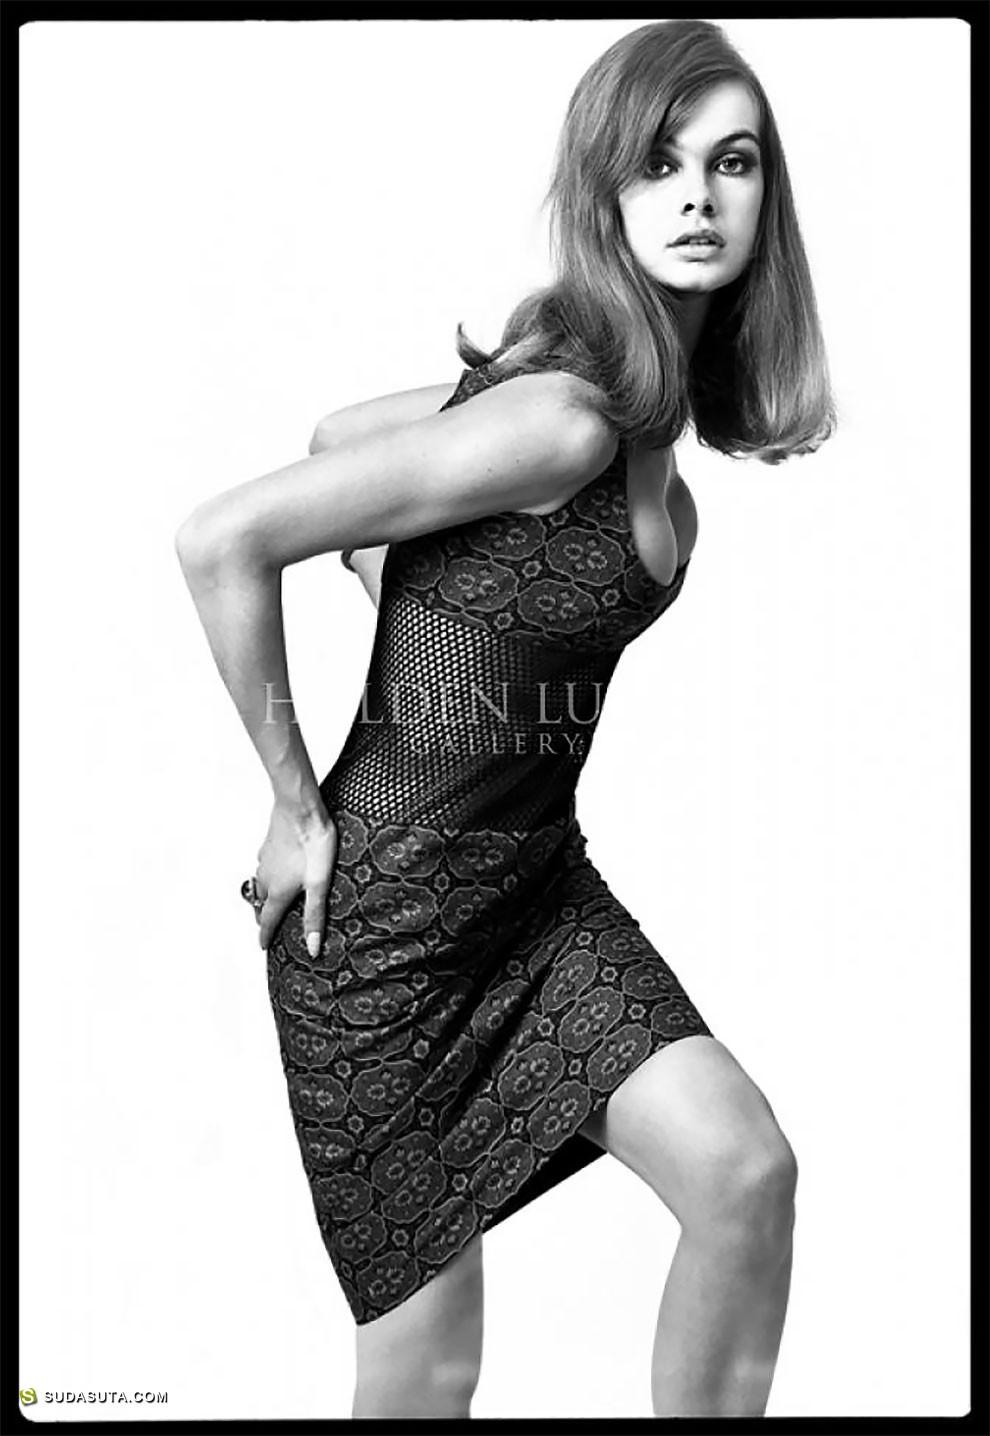 Terence Donovan 和Brian Duffy  时尚摄影欣赏